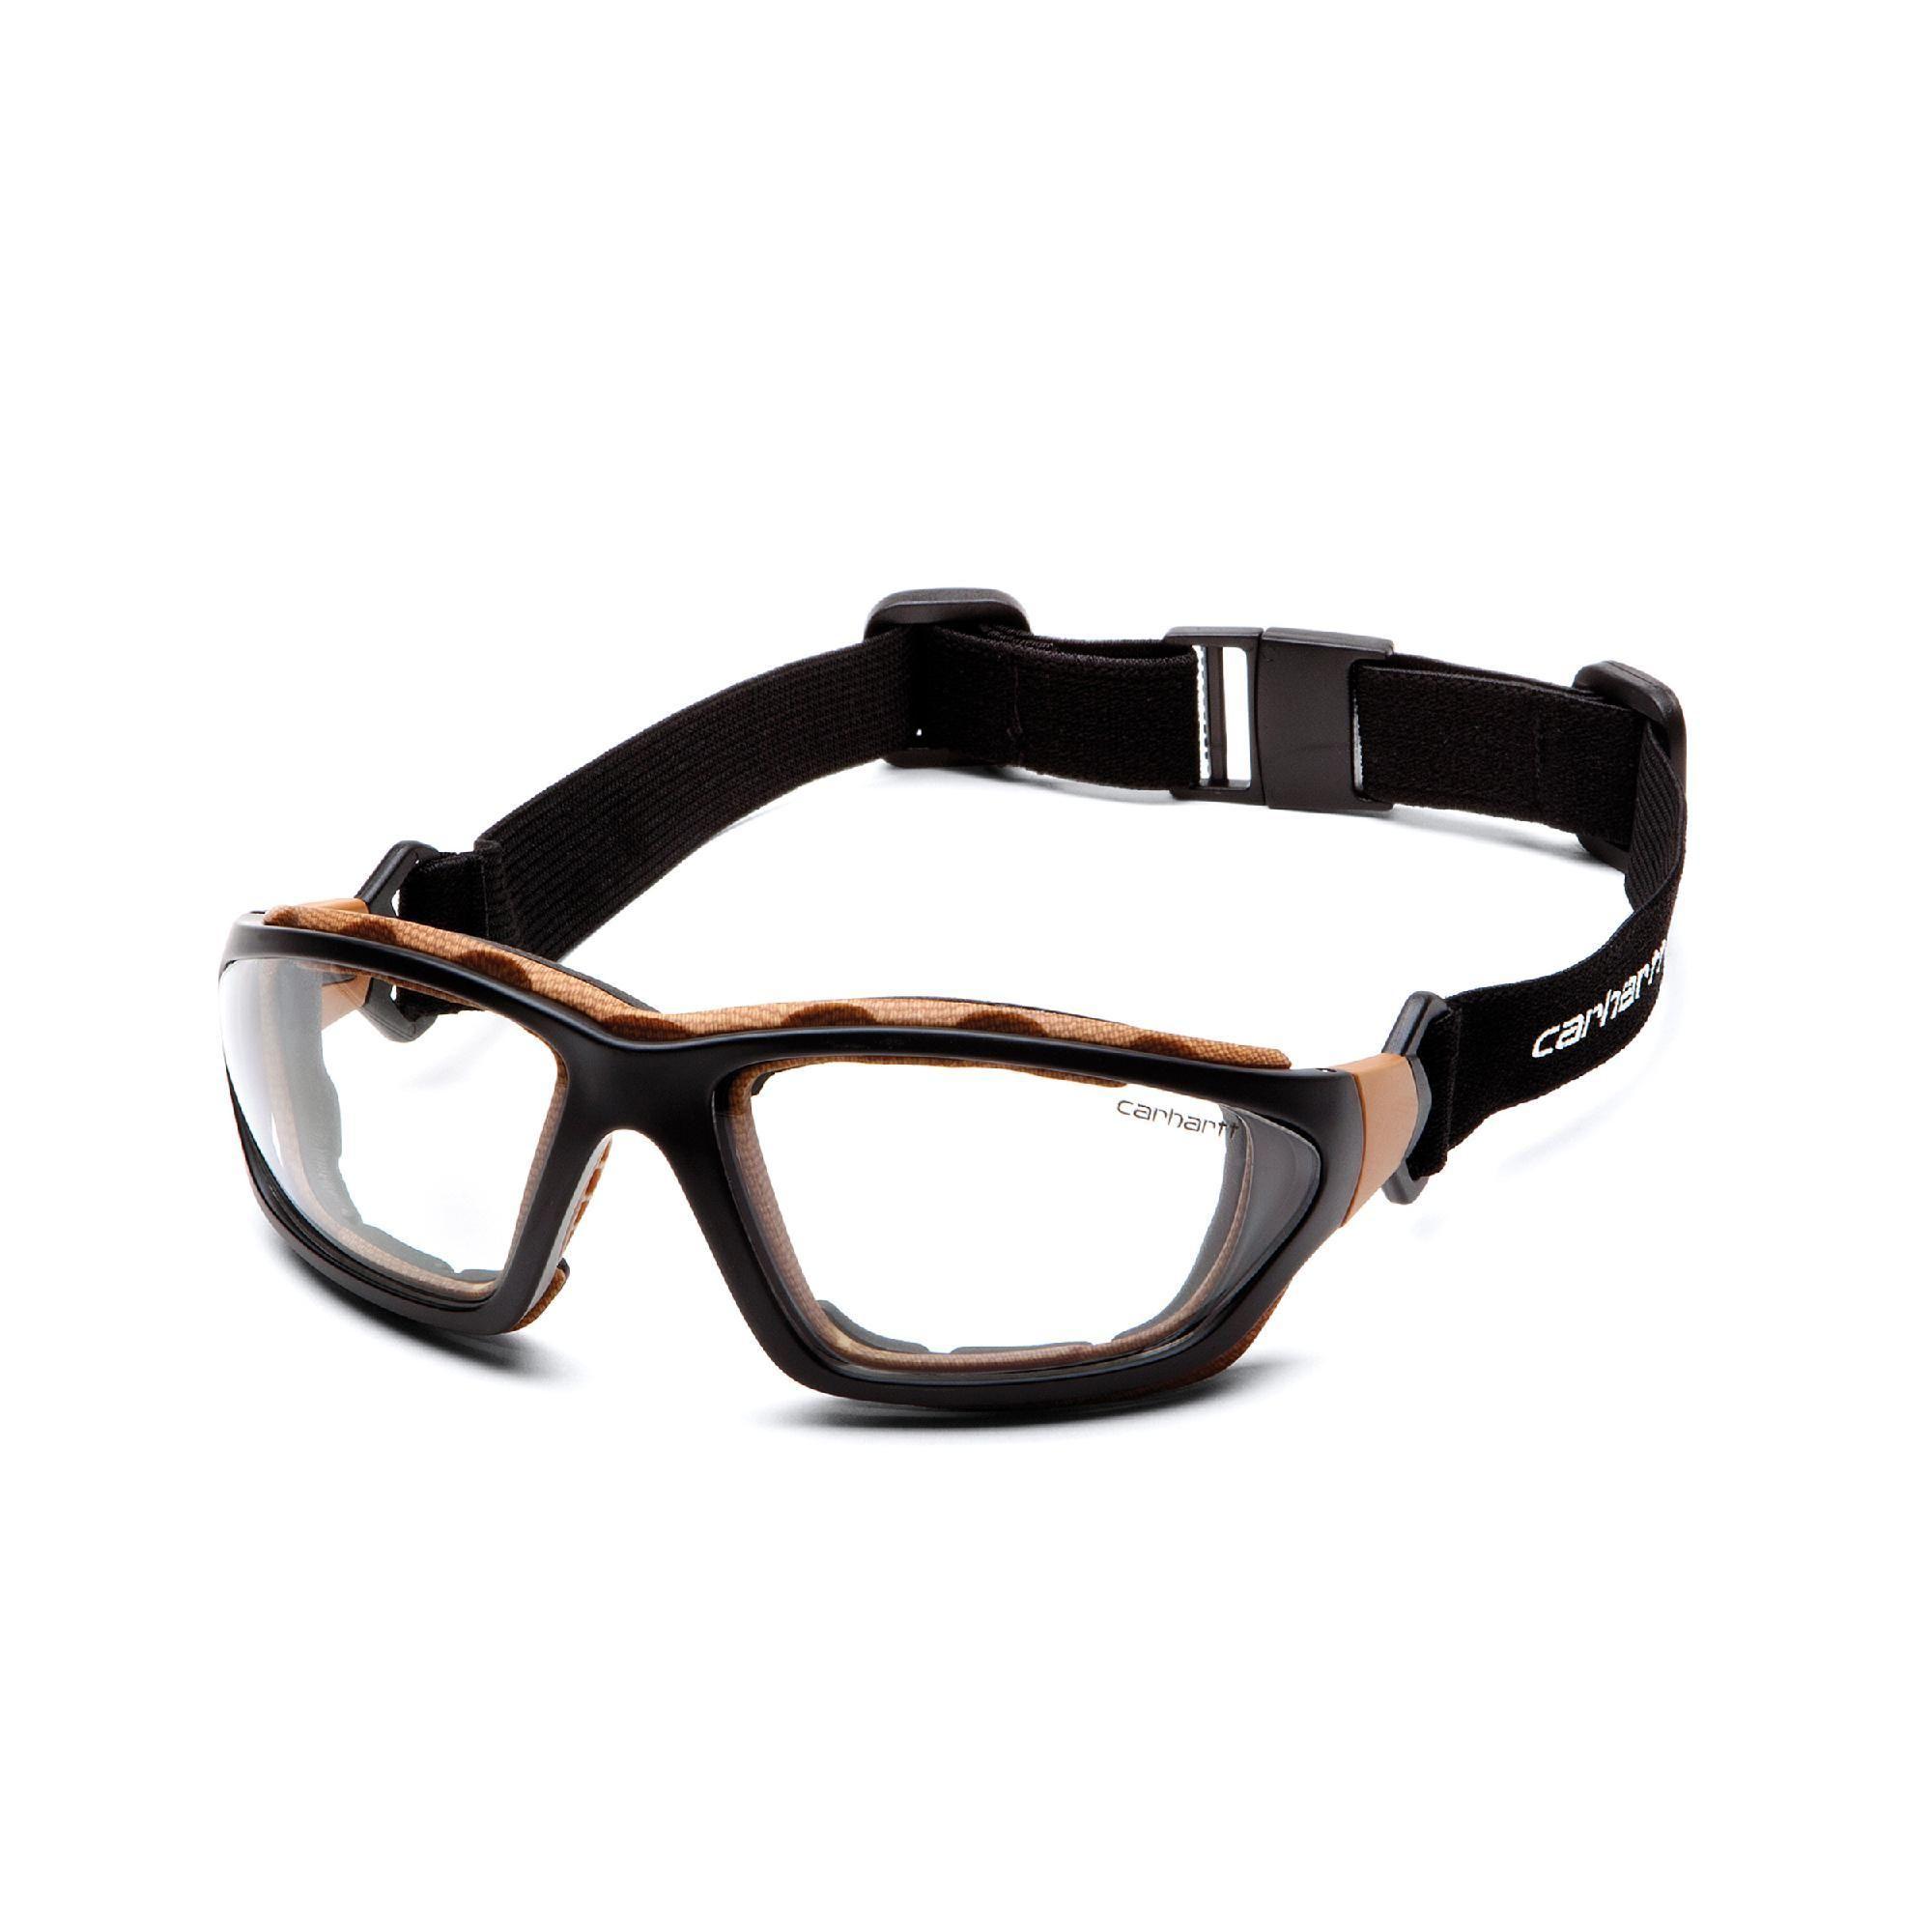 Carhartt carthage safety glasses clear antifog lens